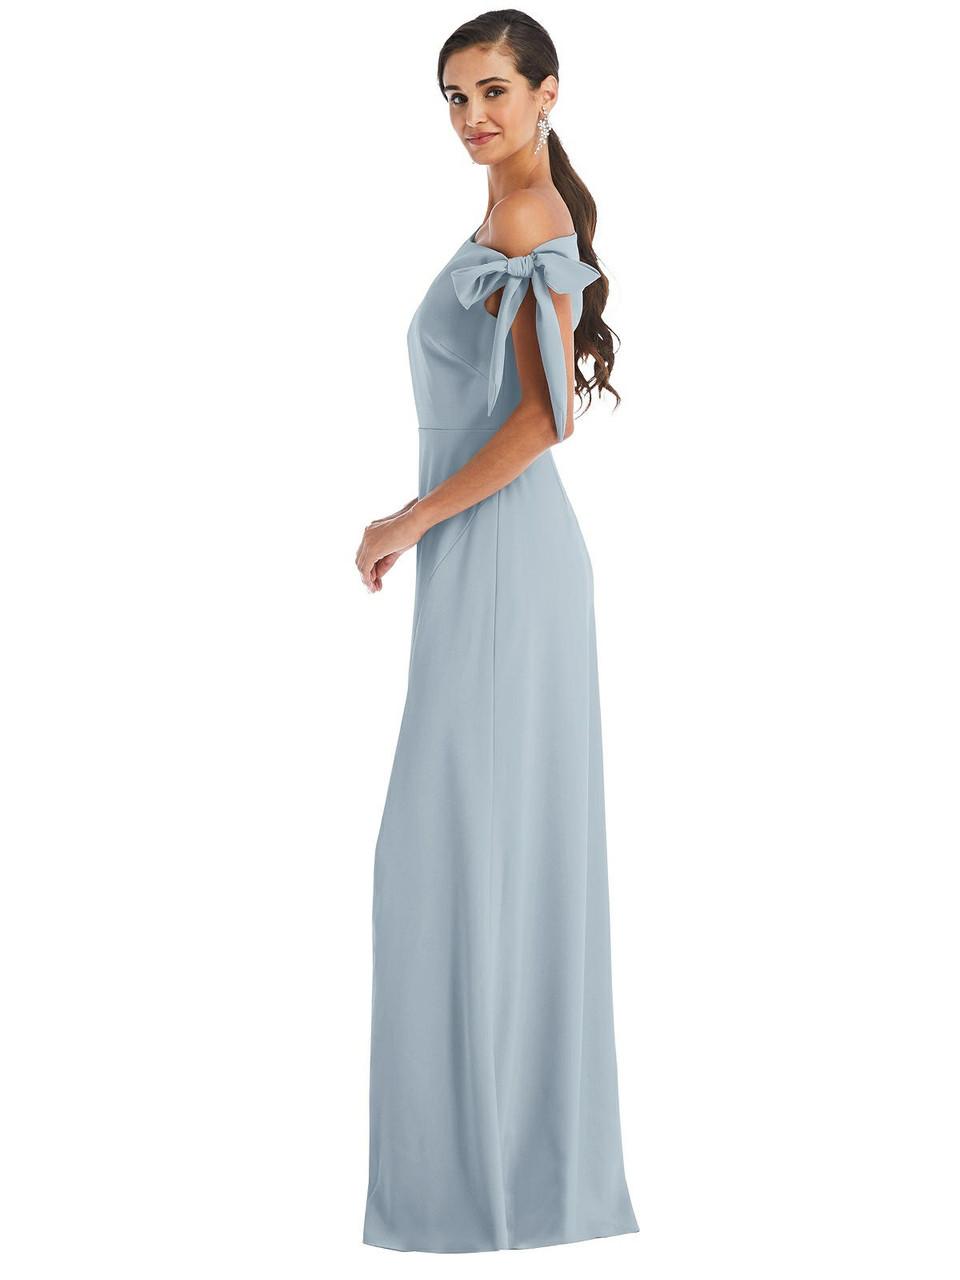 Dessy Bridesmaid Dress 3074 - Crepe